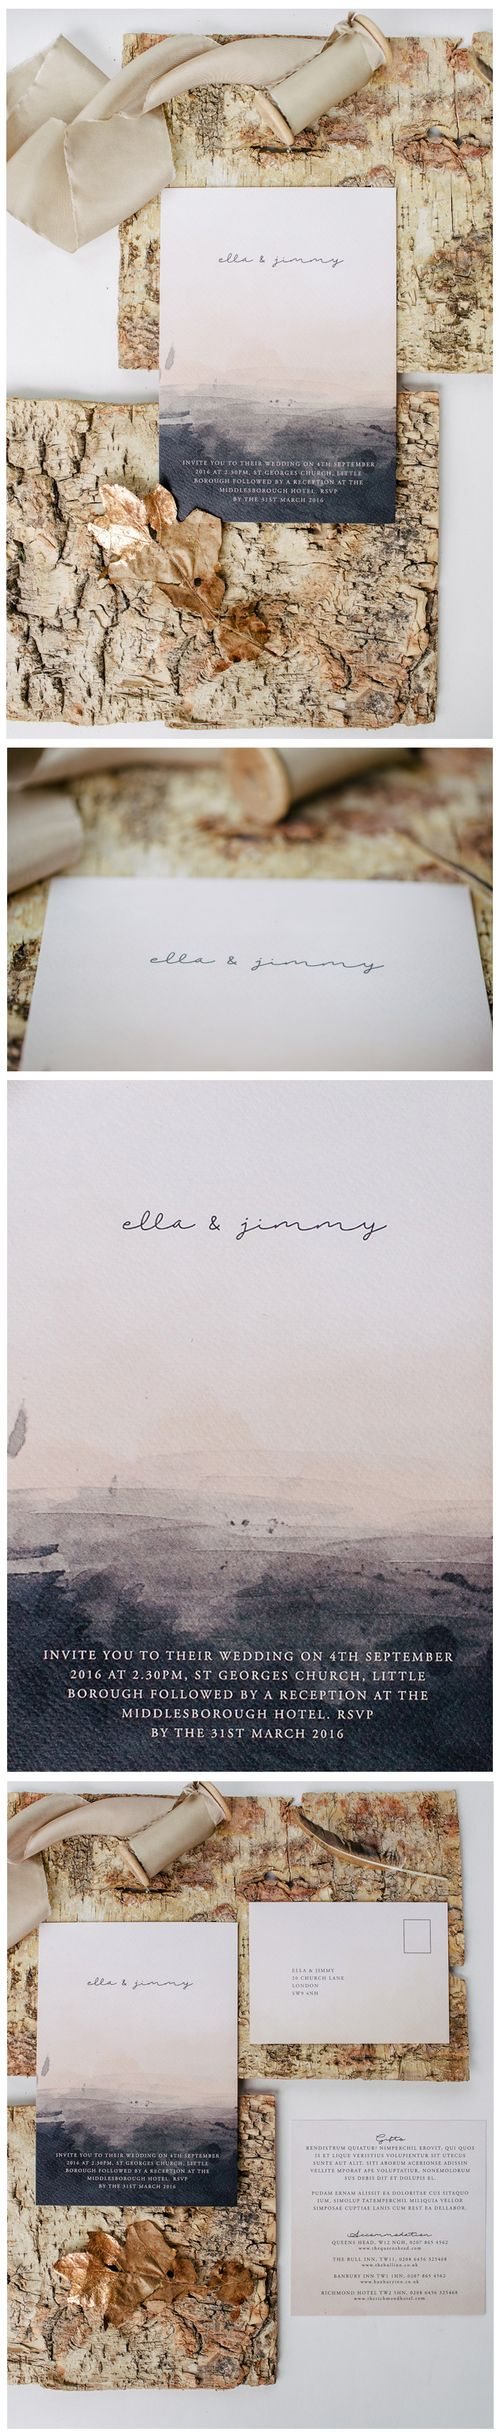 Dusty Desire wedding invitation by Lilac&White. Boho wedding invites. Bohemian weddings. Modern invitation.